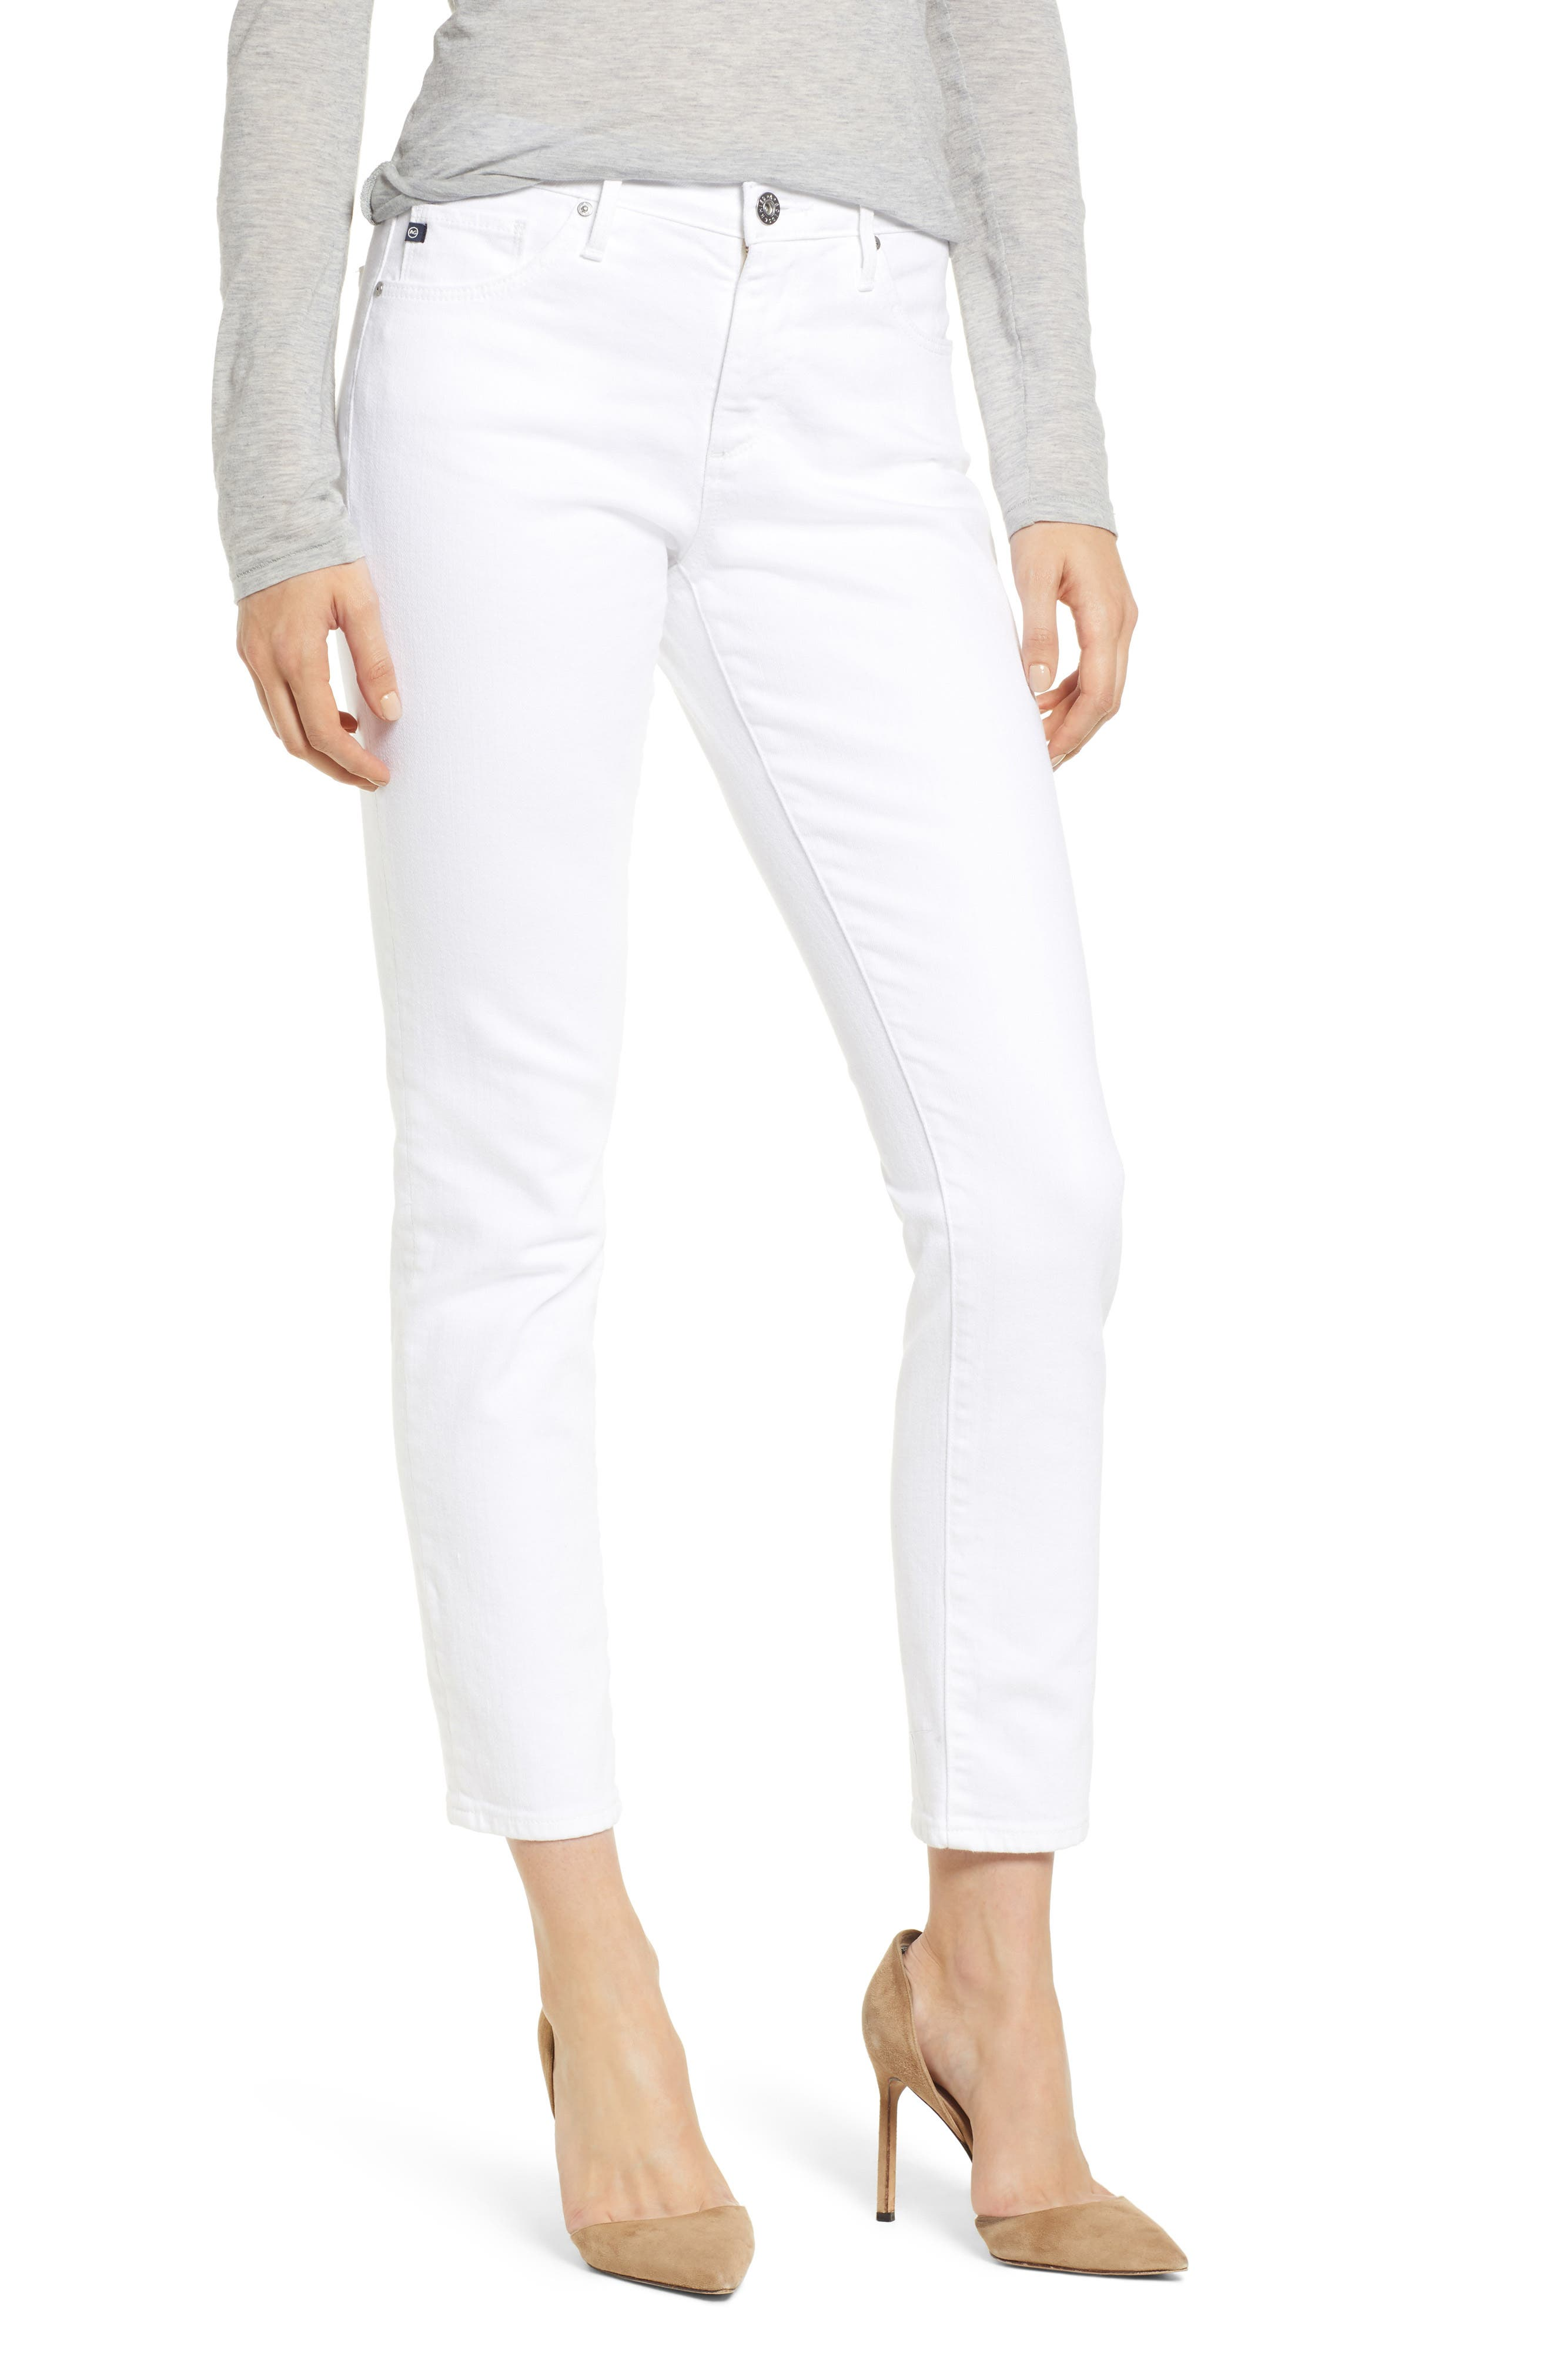 Women's Ag Prima Ankle Cigarette Jeans